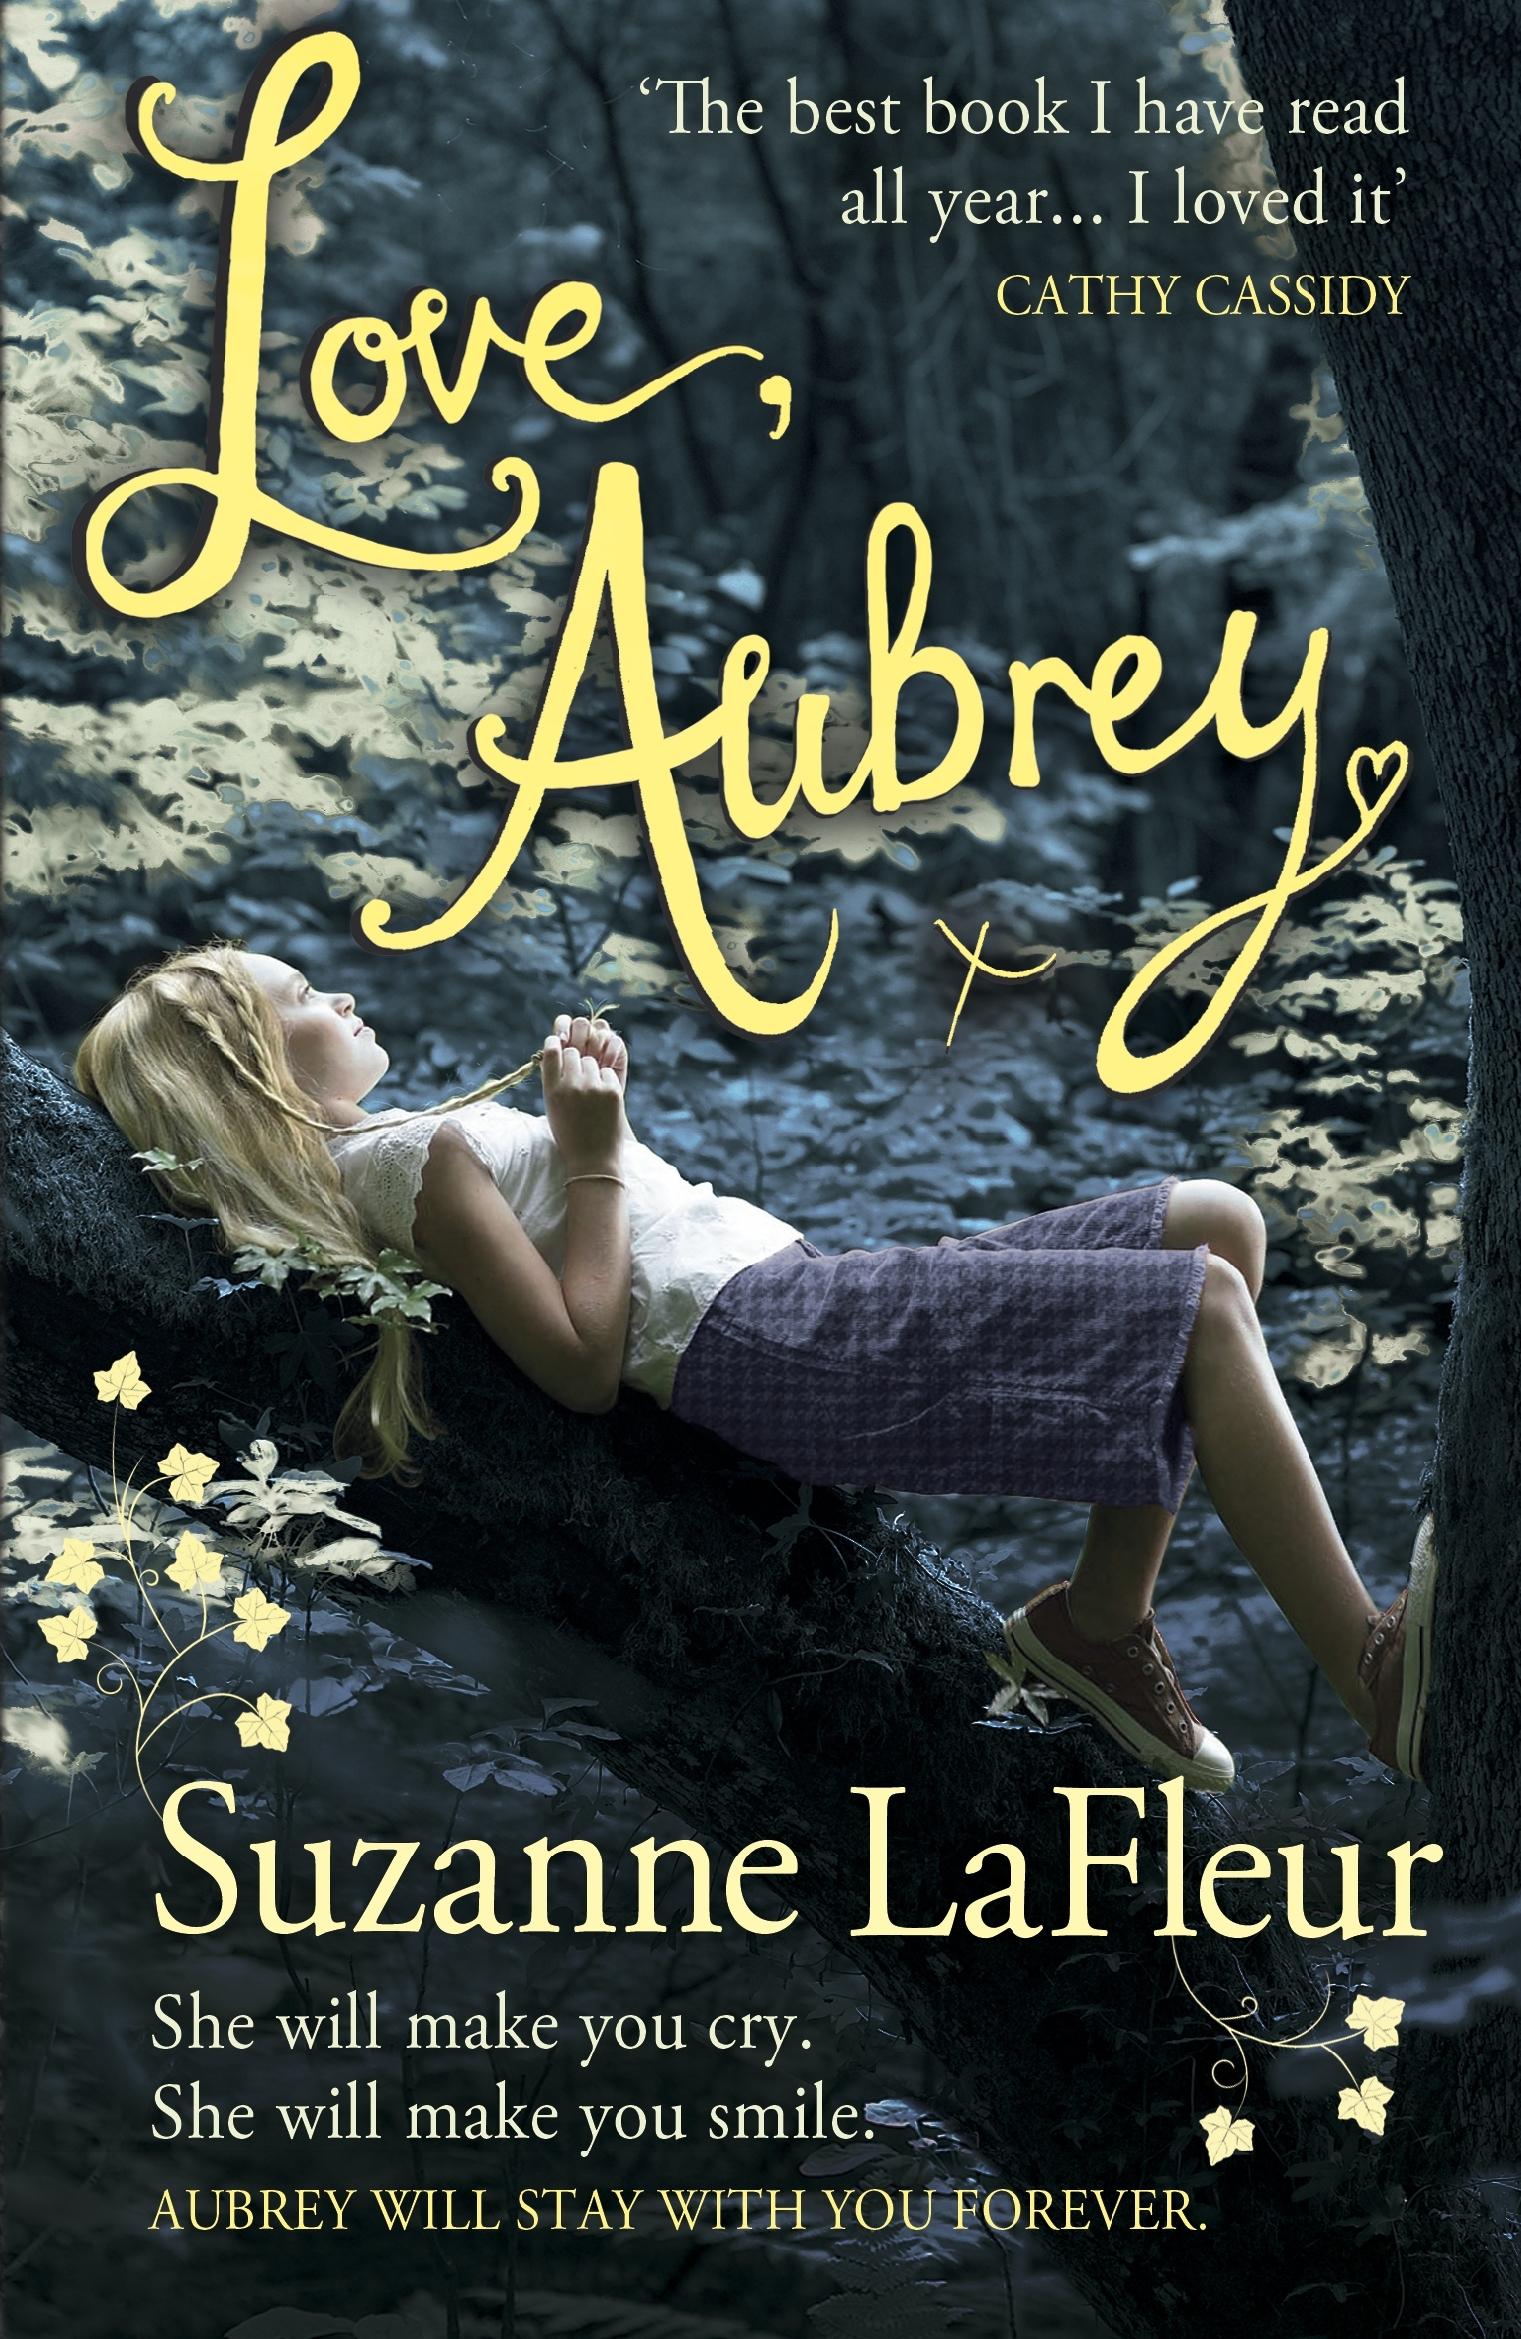 Love Aubery